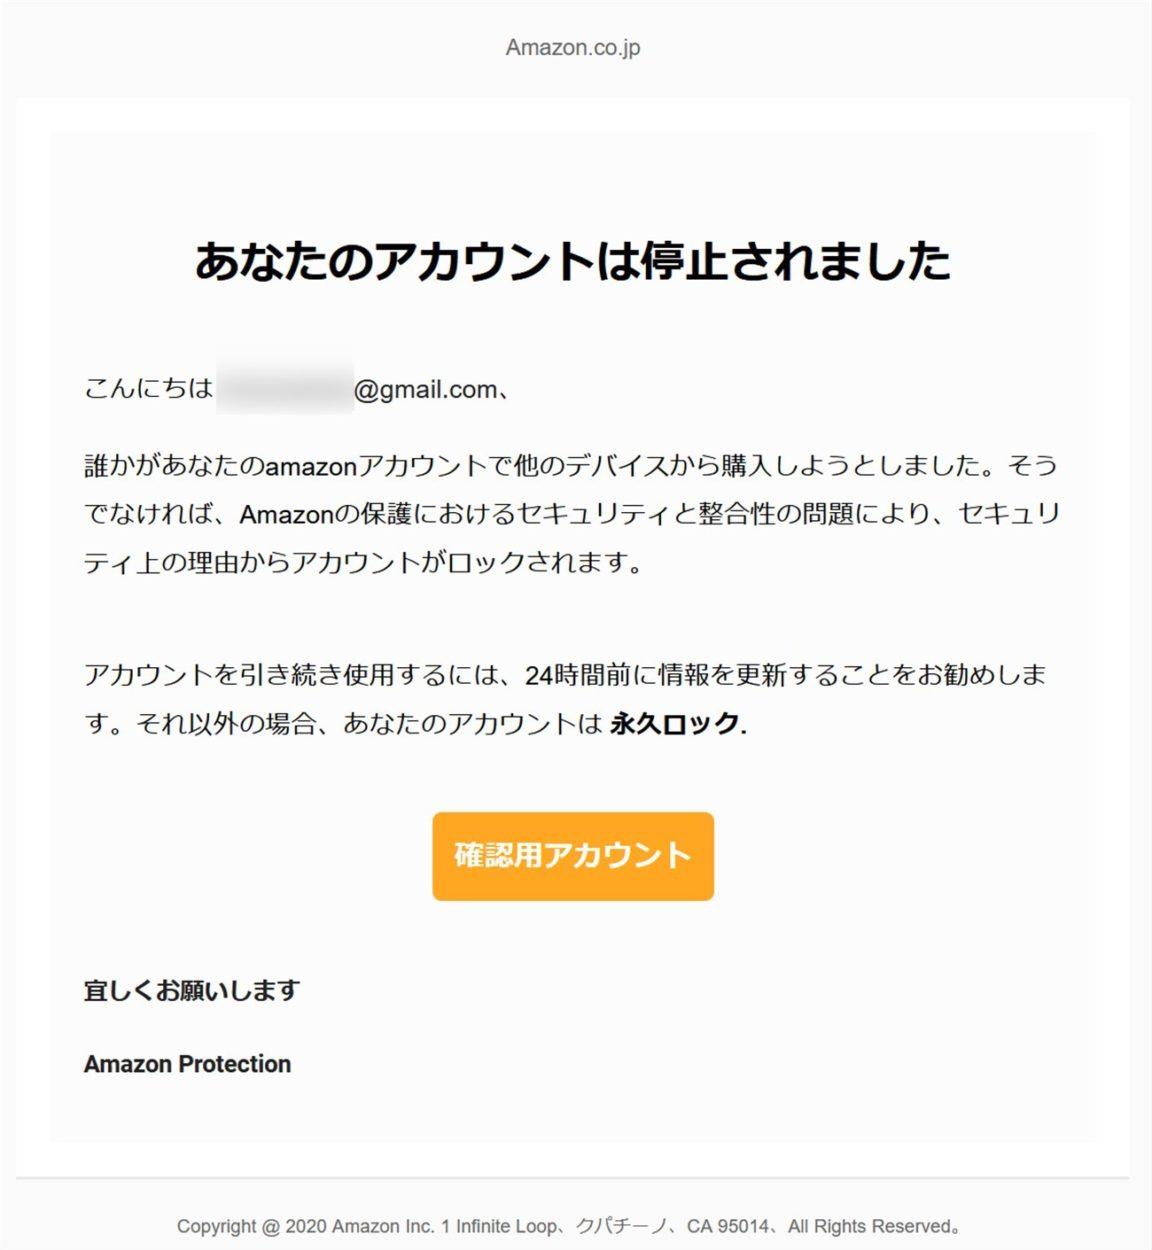 Amazonセキュリティ警告:サインインが検出されました